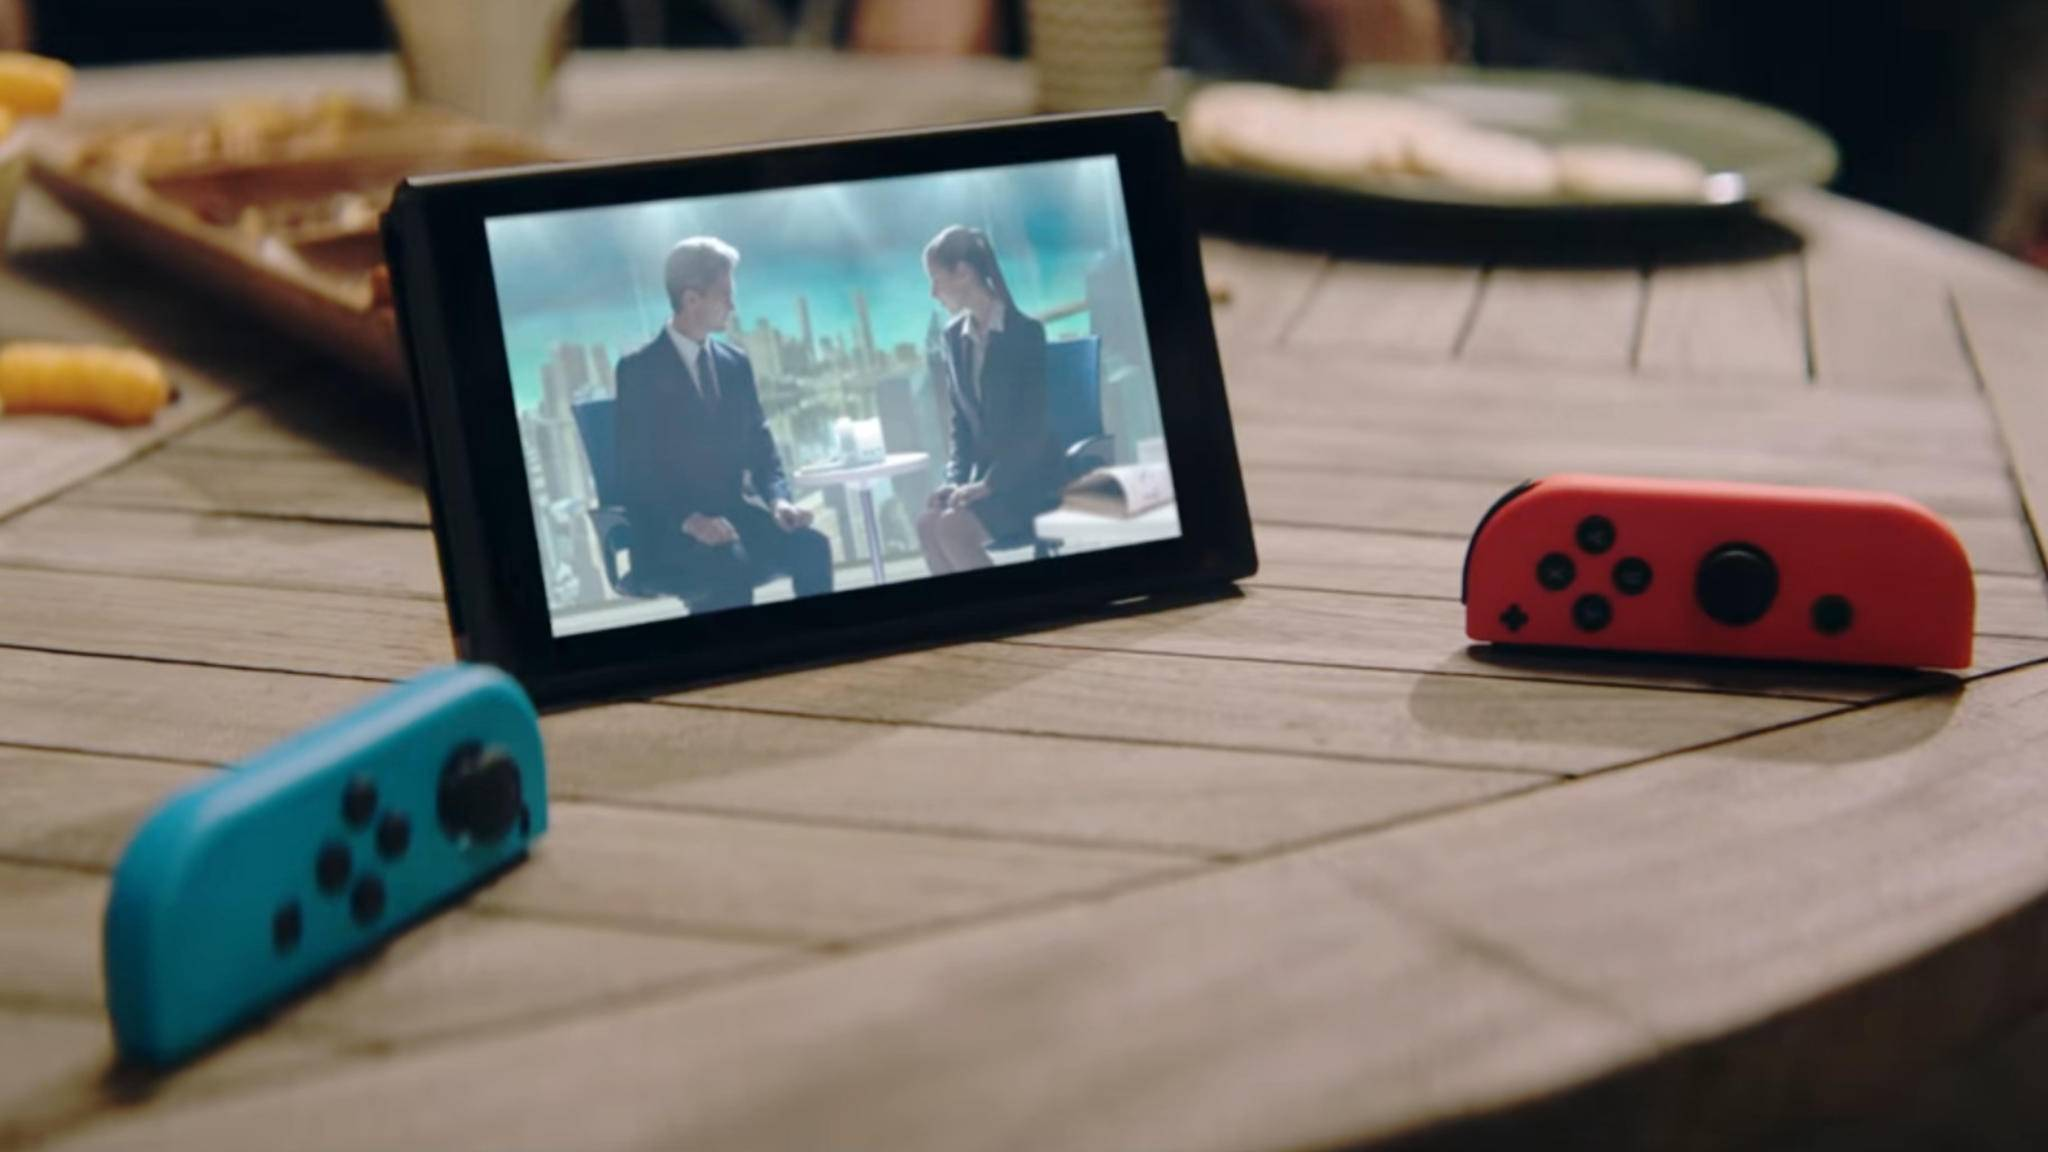 Bald an Bord: Video-Streaming-Apps für die Nintendo Switch.